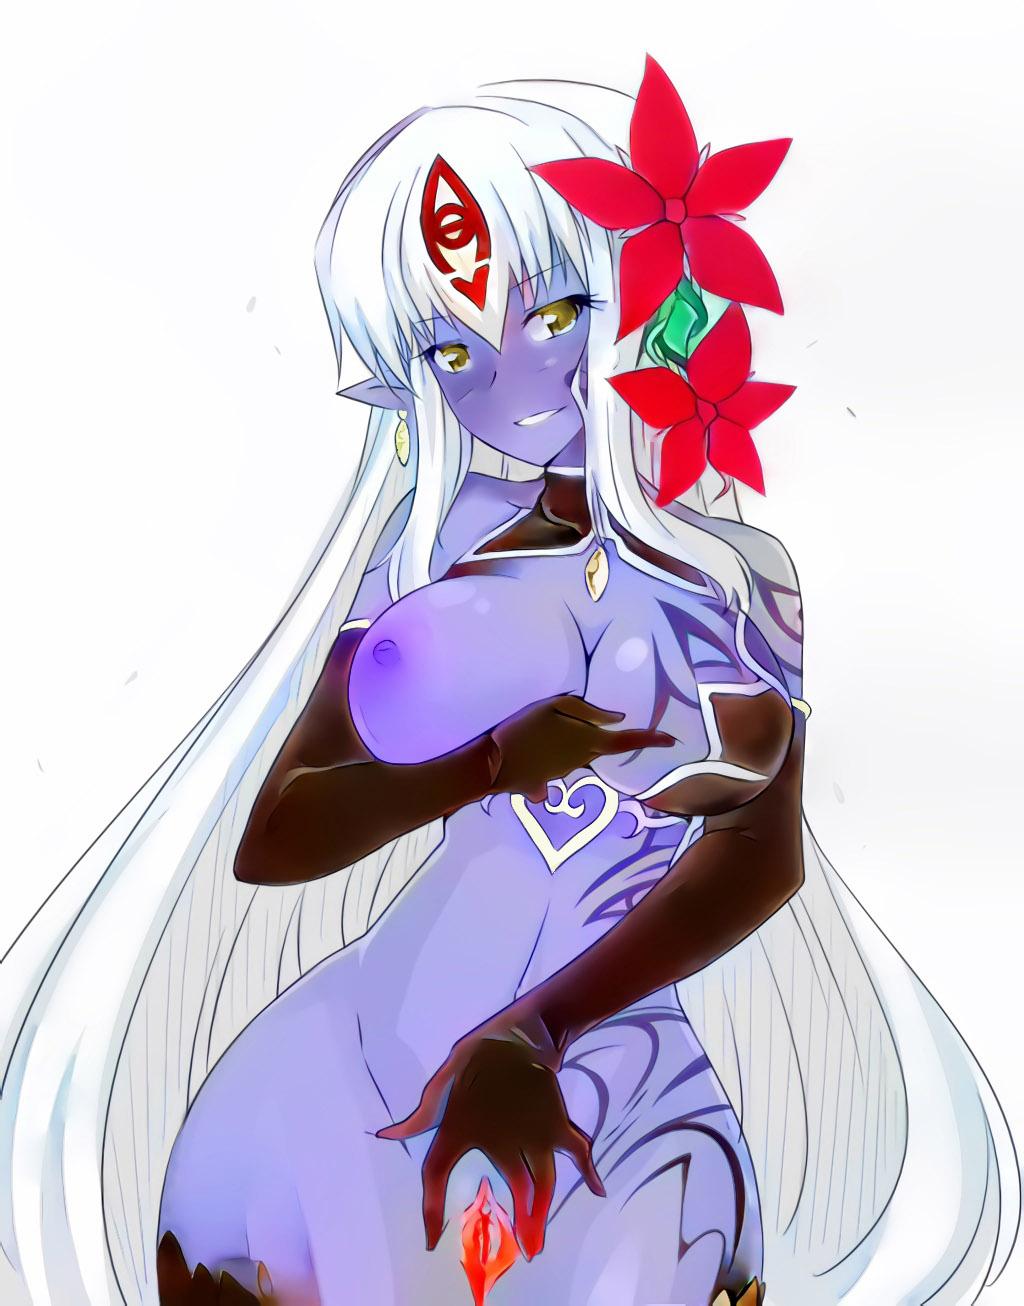 girl girl dragon monster quest Star wars the clone wars ahsoka nude